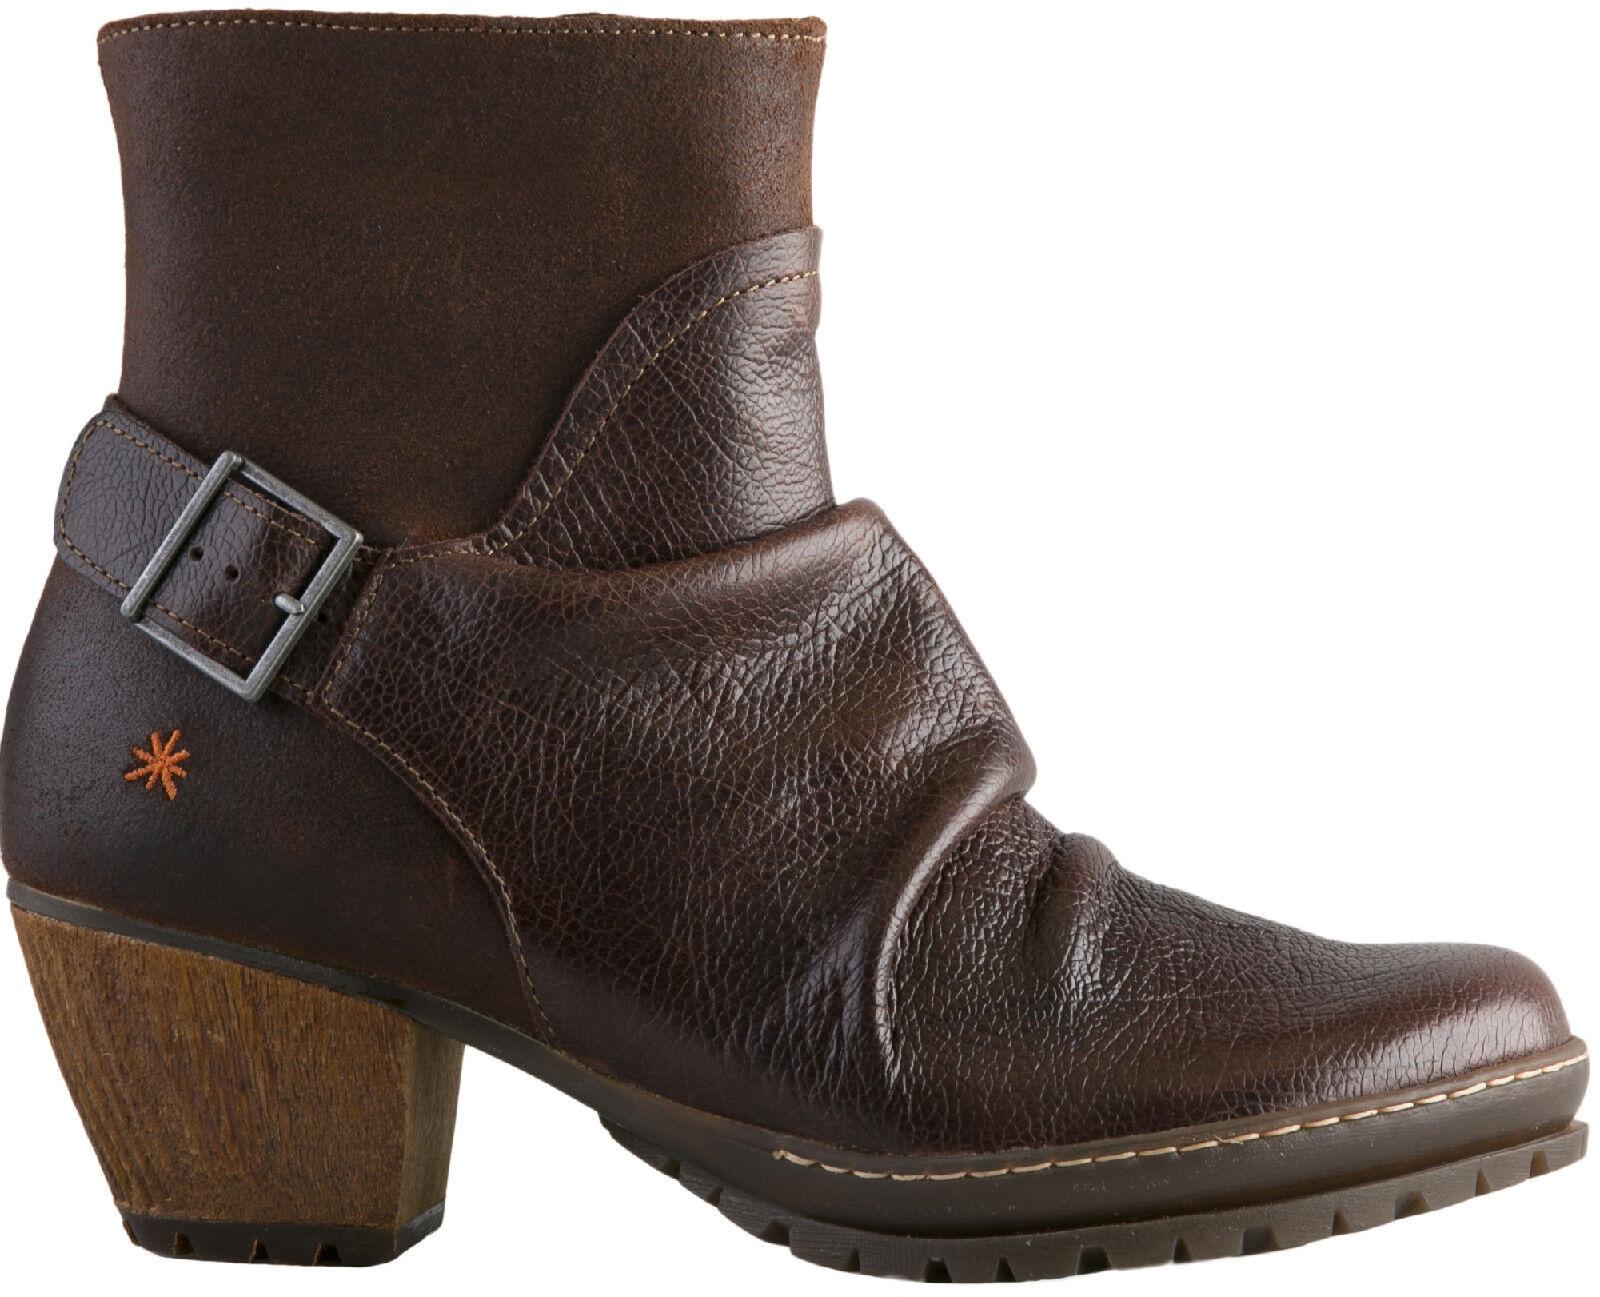 The Damenschuhe ART Company Schuhe 0516 Damenschuhe The Stiefelette Moka Gaucho Wax 875988